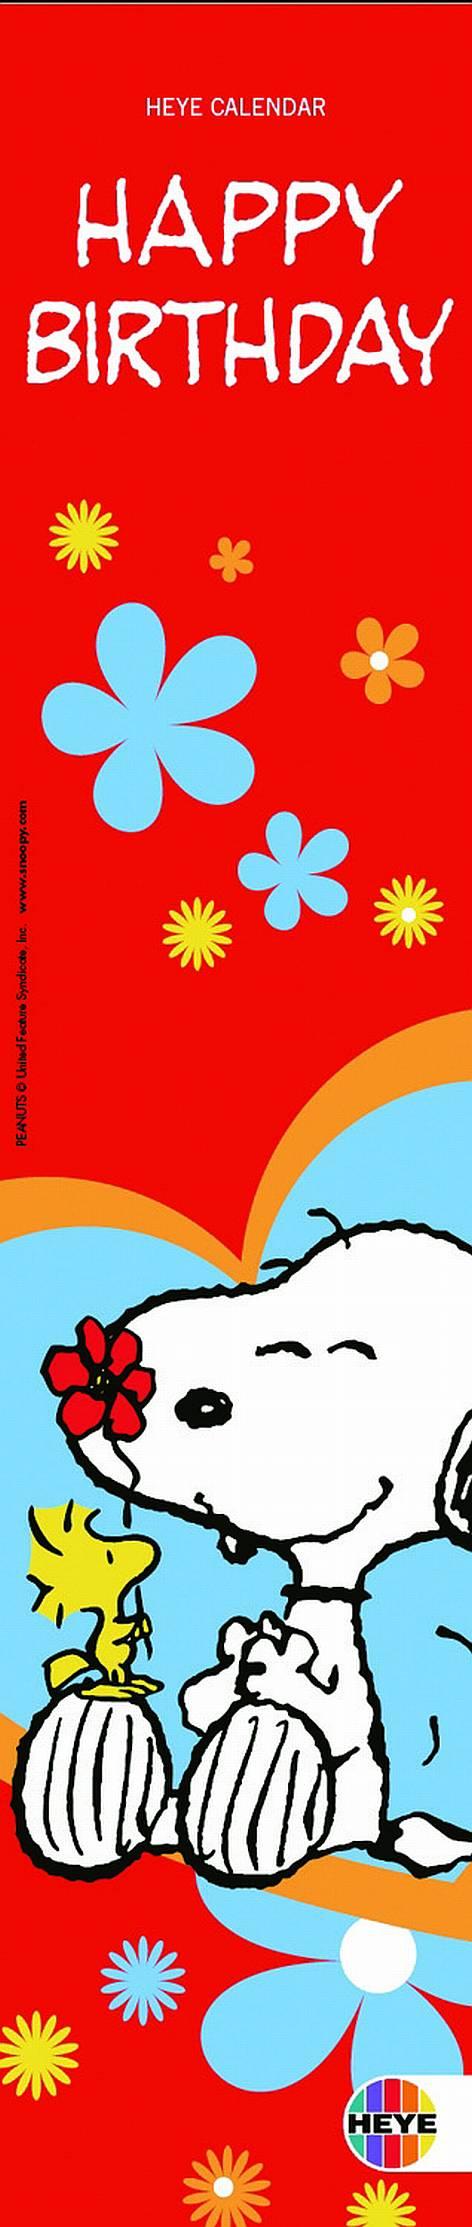 Geburtstagskalender Snoopy 7x33cm jahresunabhängig